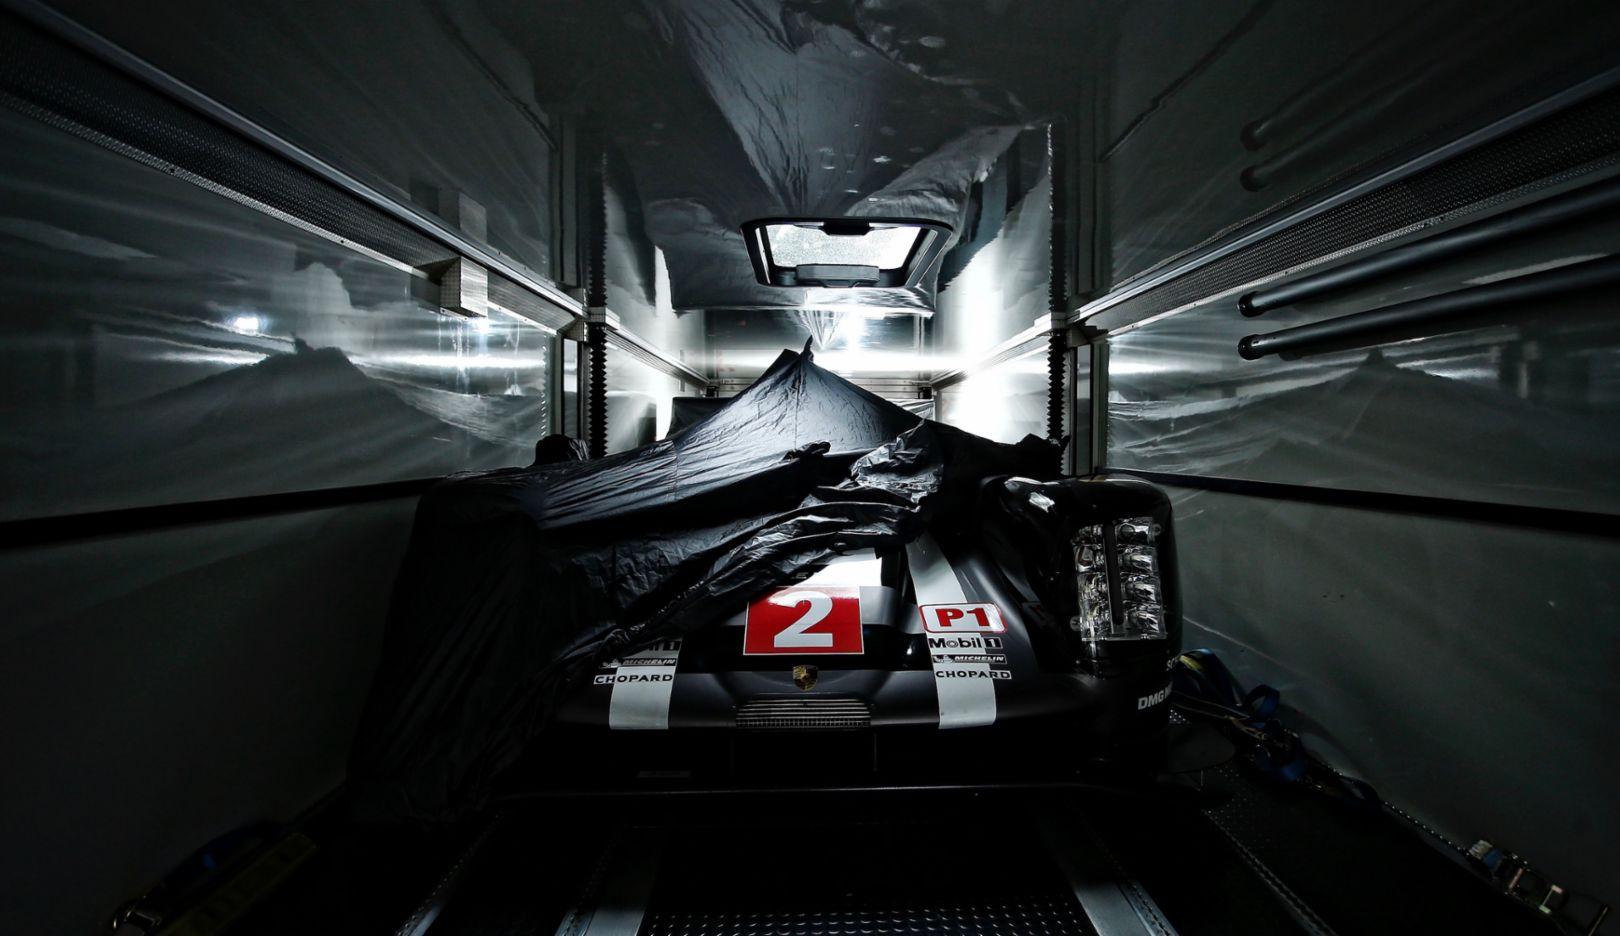 Porsche 919 Hybrid, Technische Abnahme, WEC, Le Mans, 2016, Porsche AG